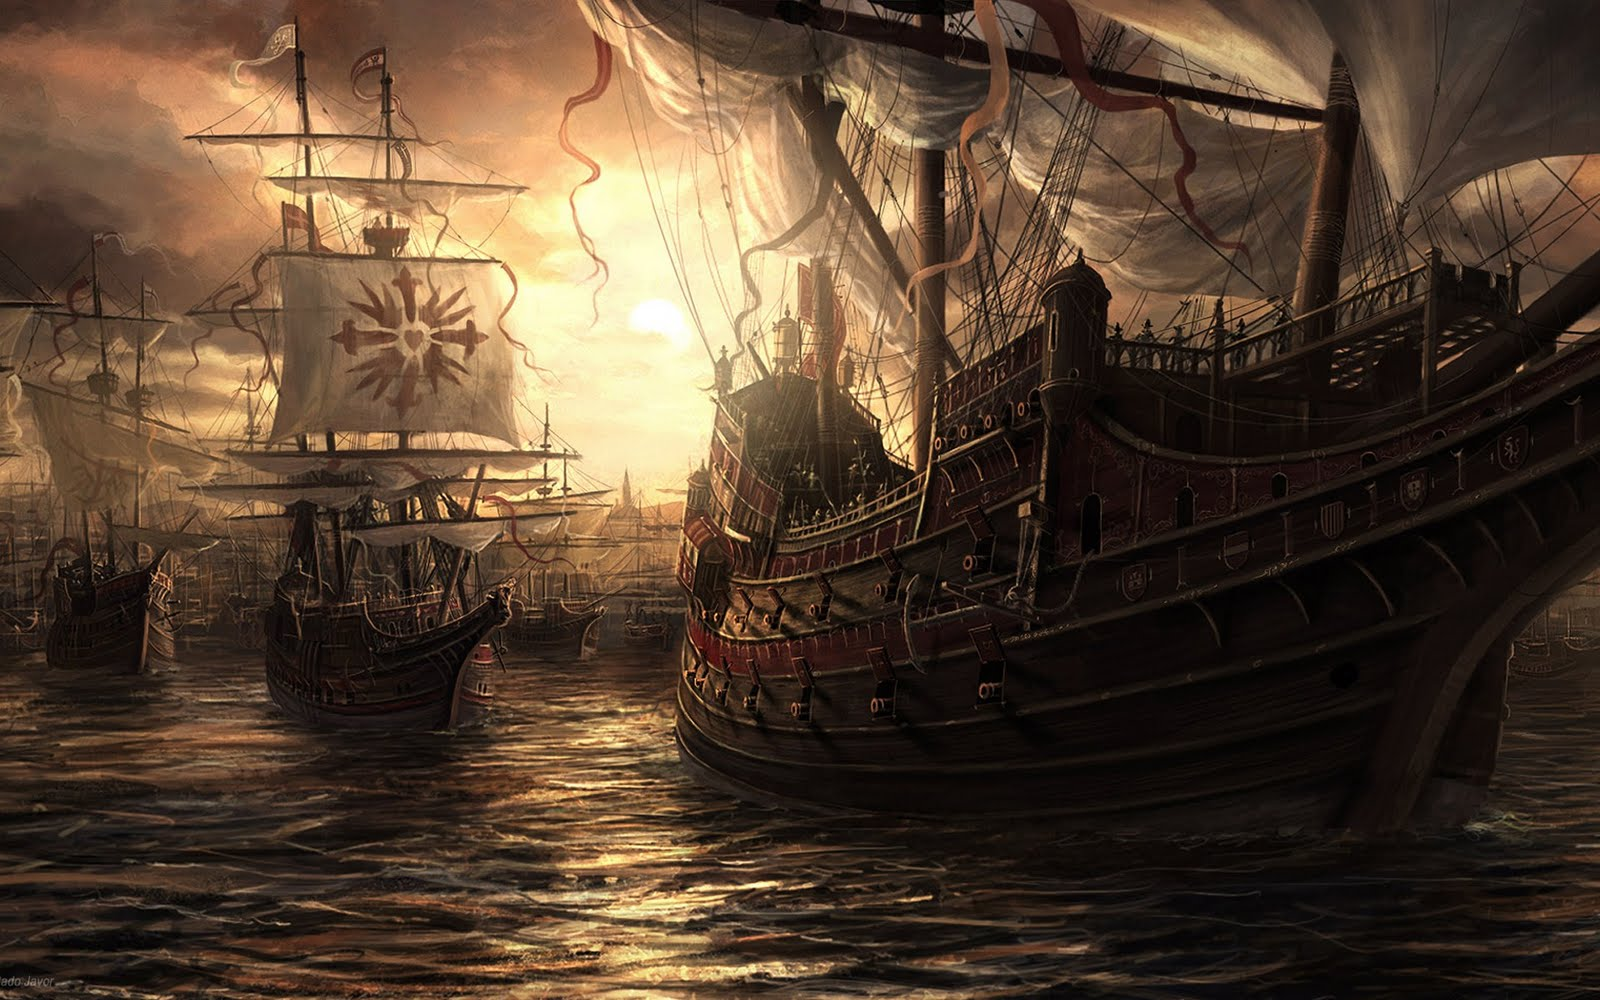 Wallpapers: Desktop, PSP, CellPhones, Laptops & Freebies!: Old Pirate ...